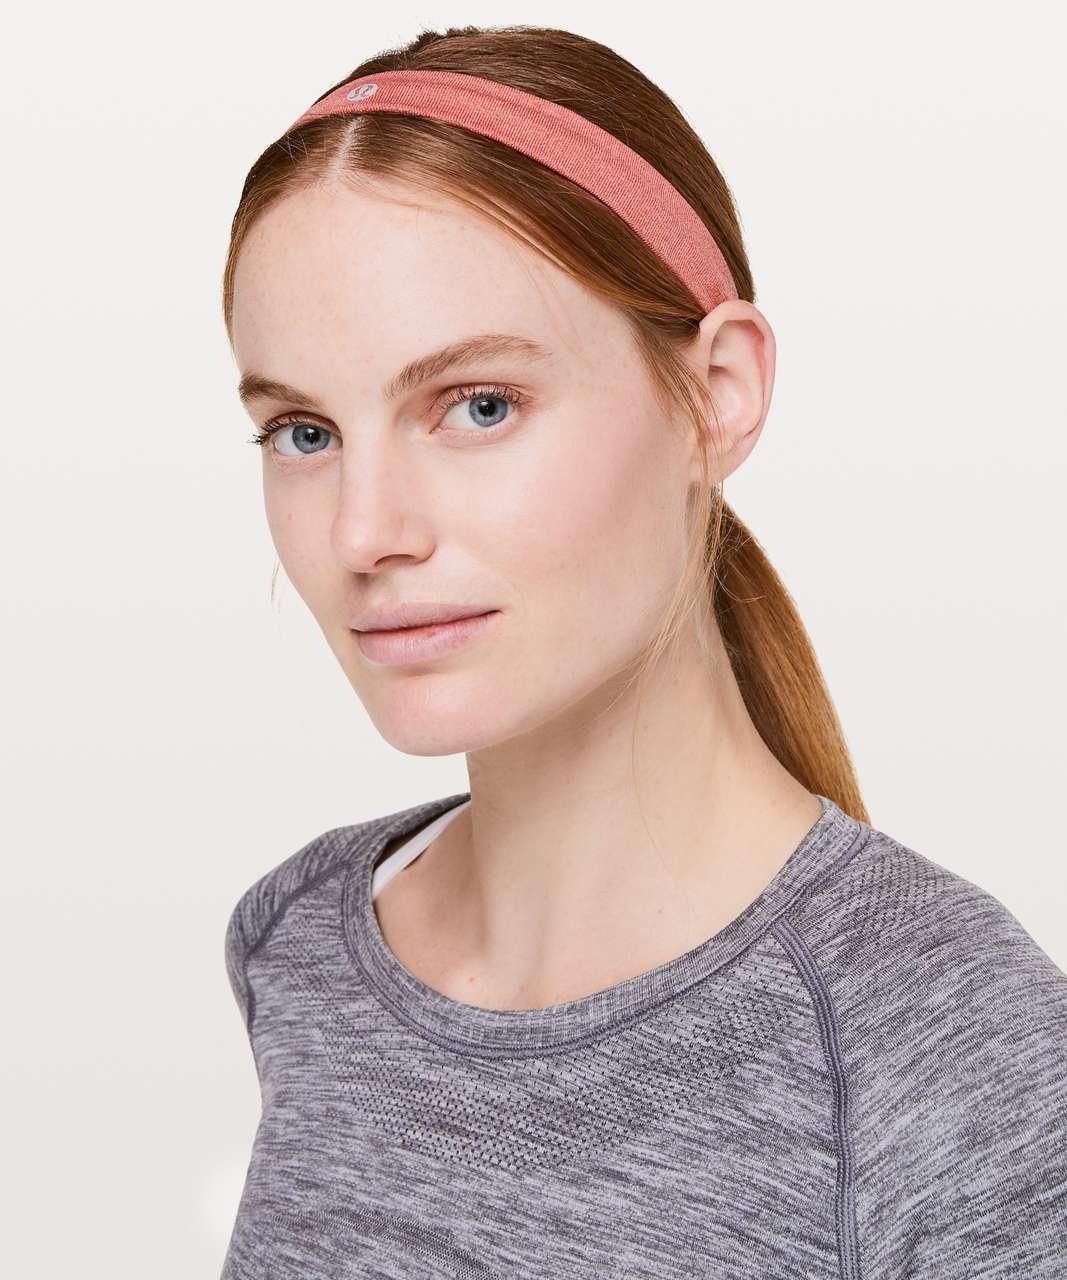 Lululemon Cardio Cross Trainer Headband - Aries / White